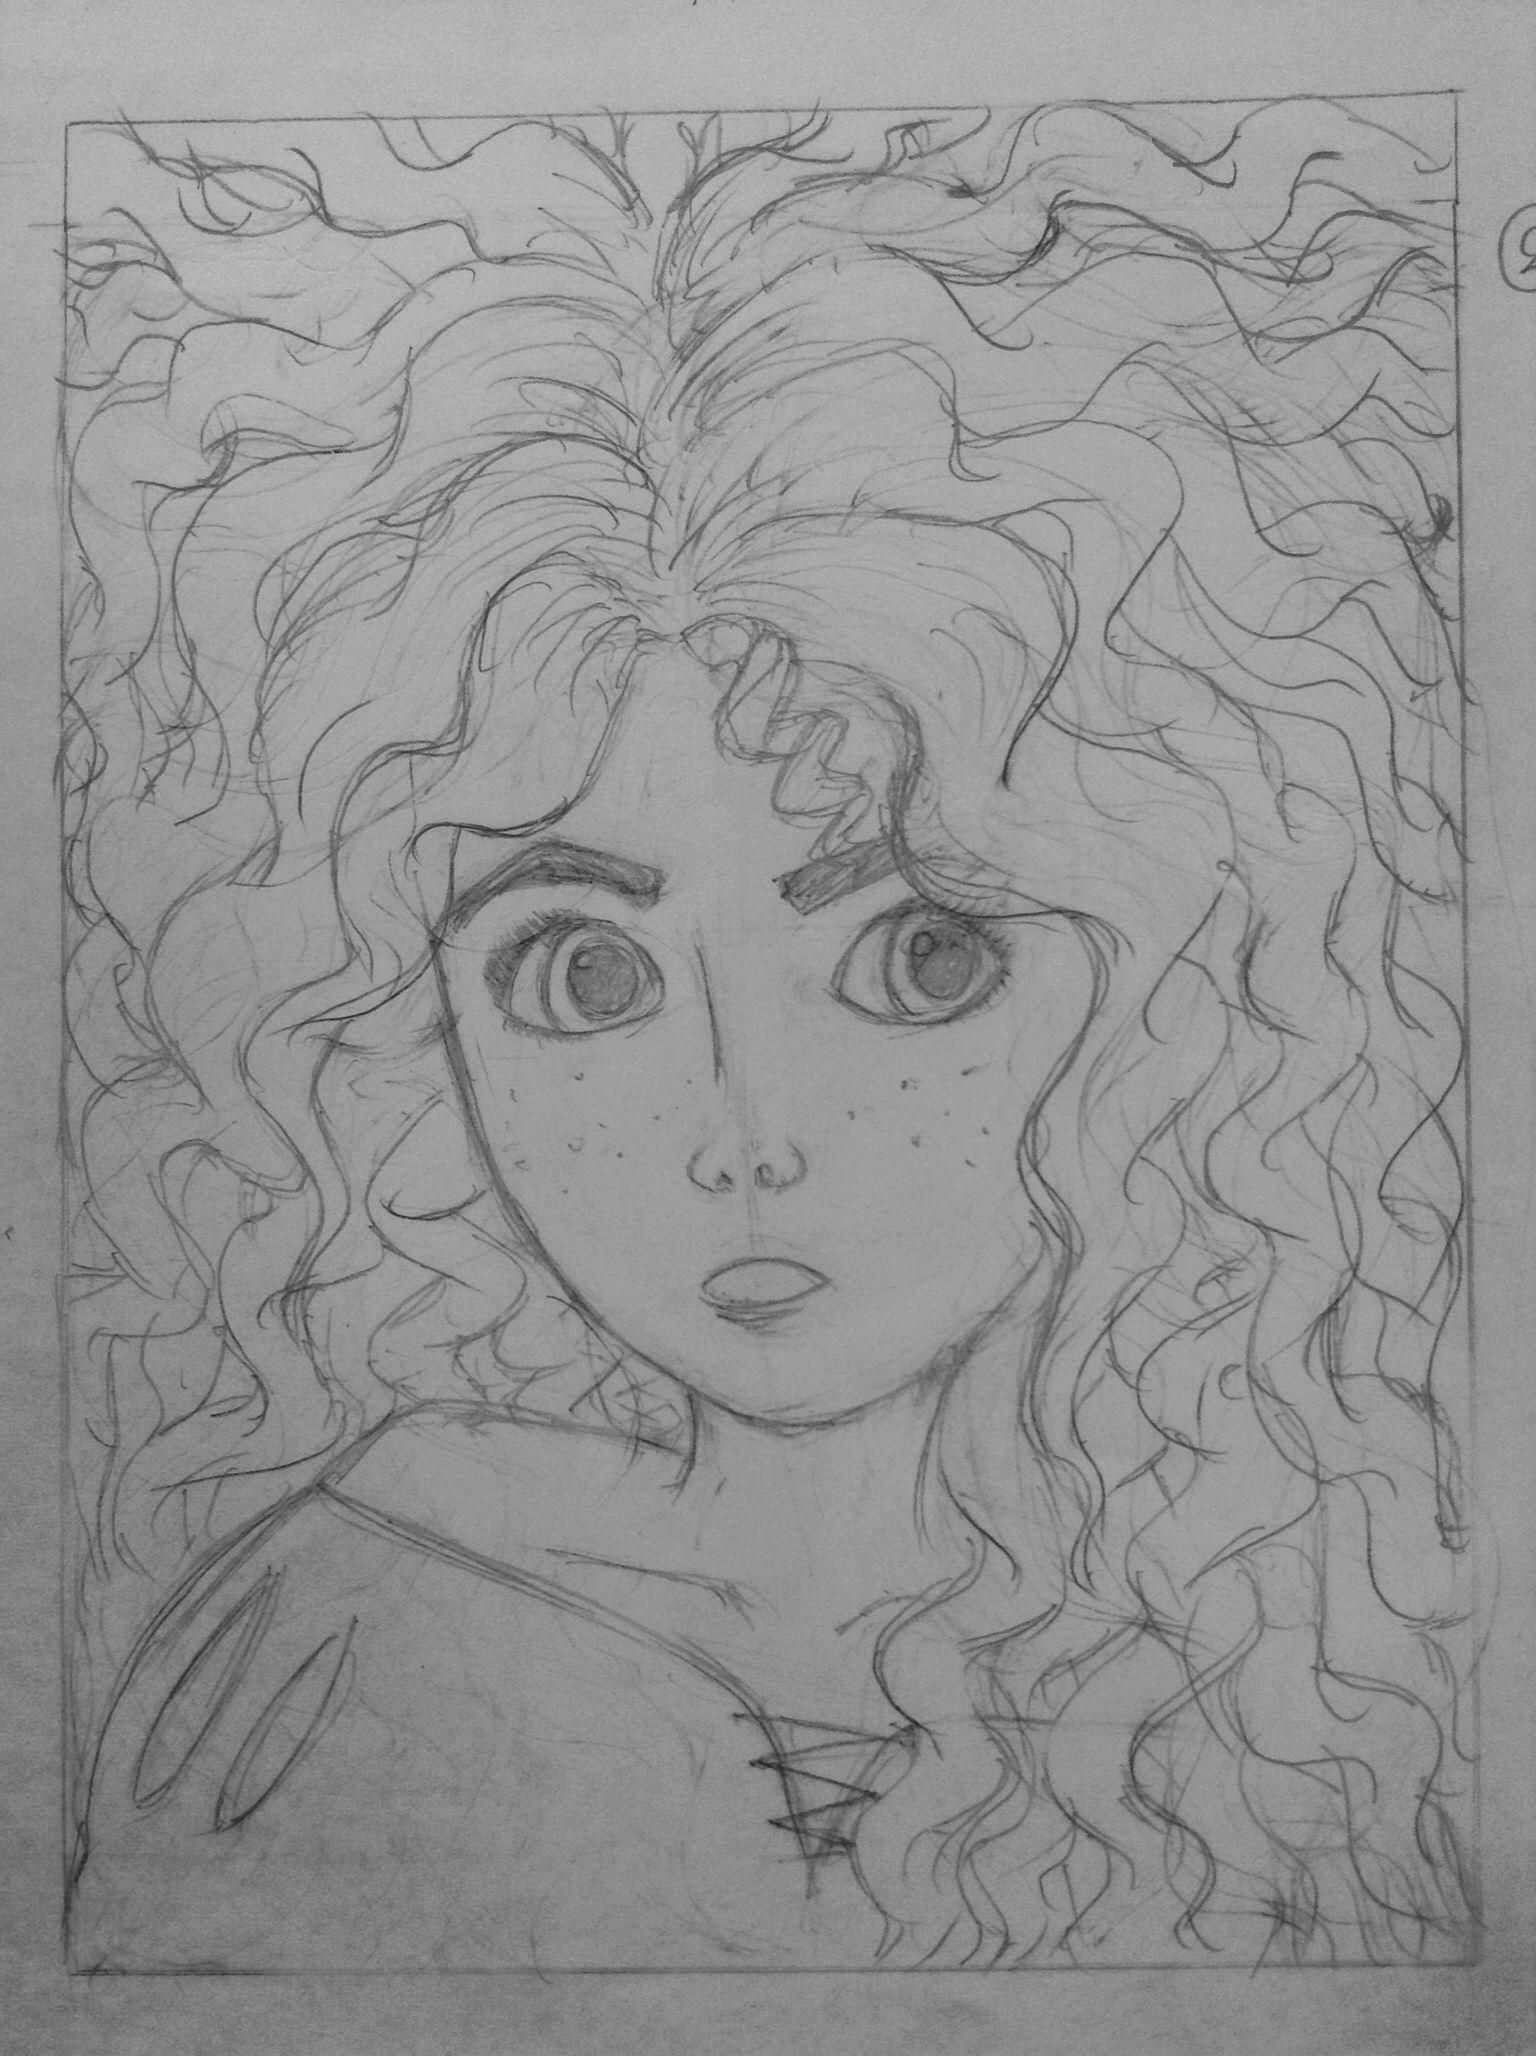 Drawings Merida from Brave